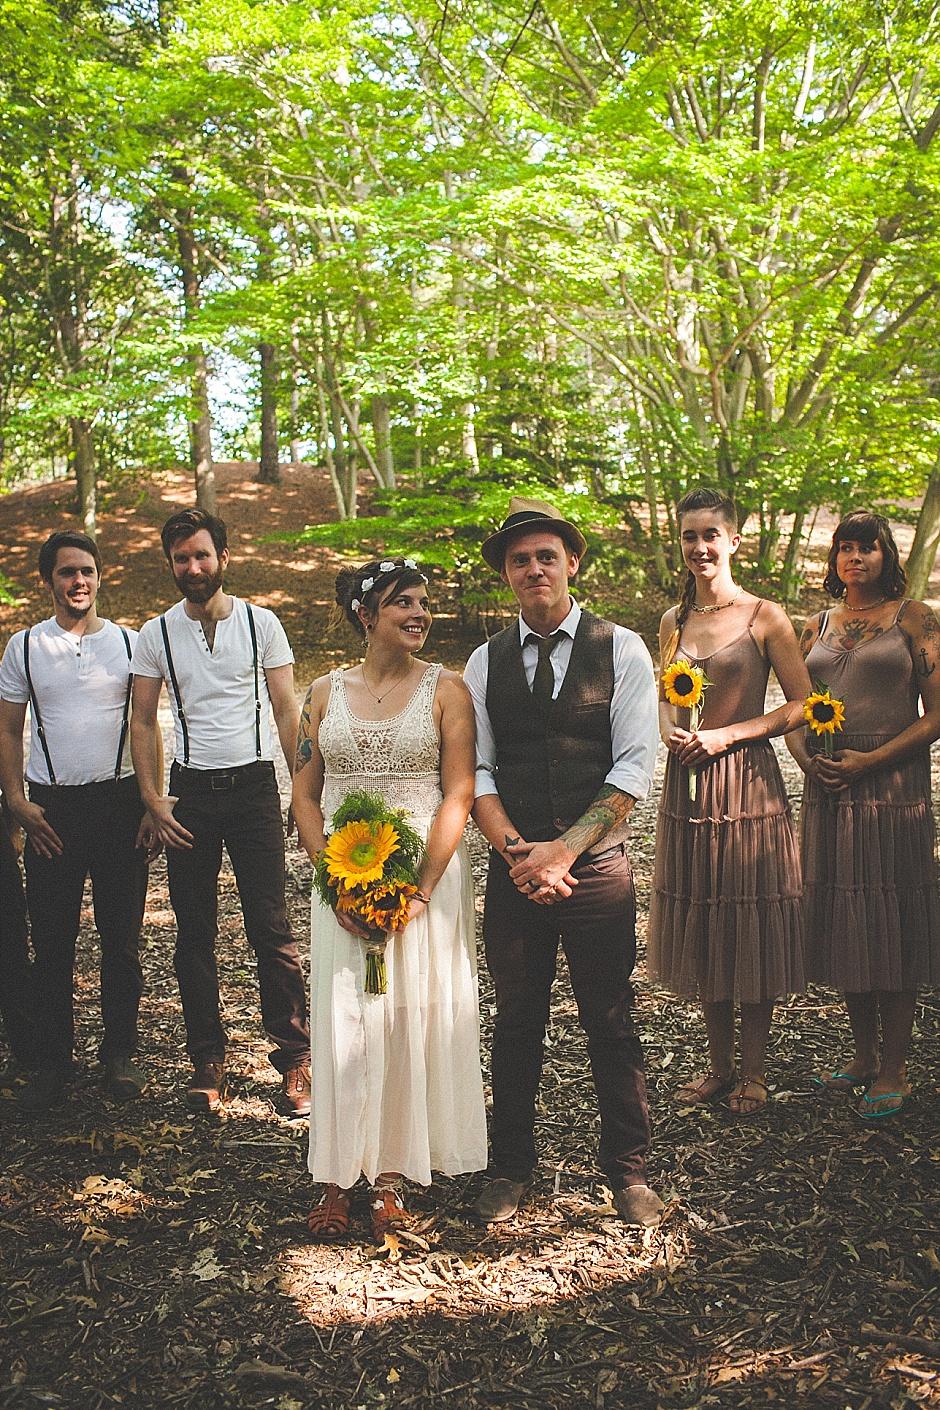 barefootwedding_hudsonvillemi_weddingphotographer093